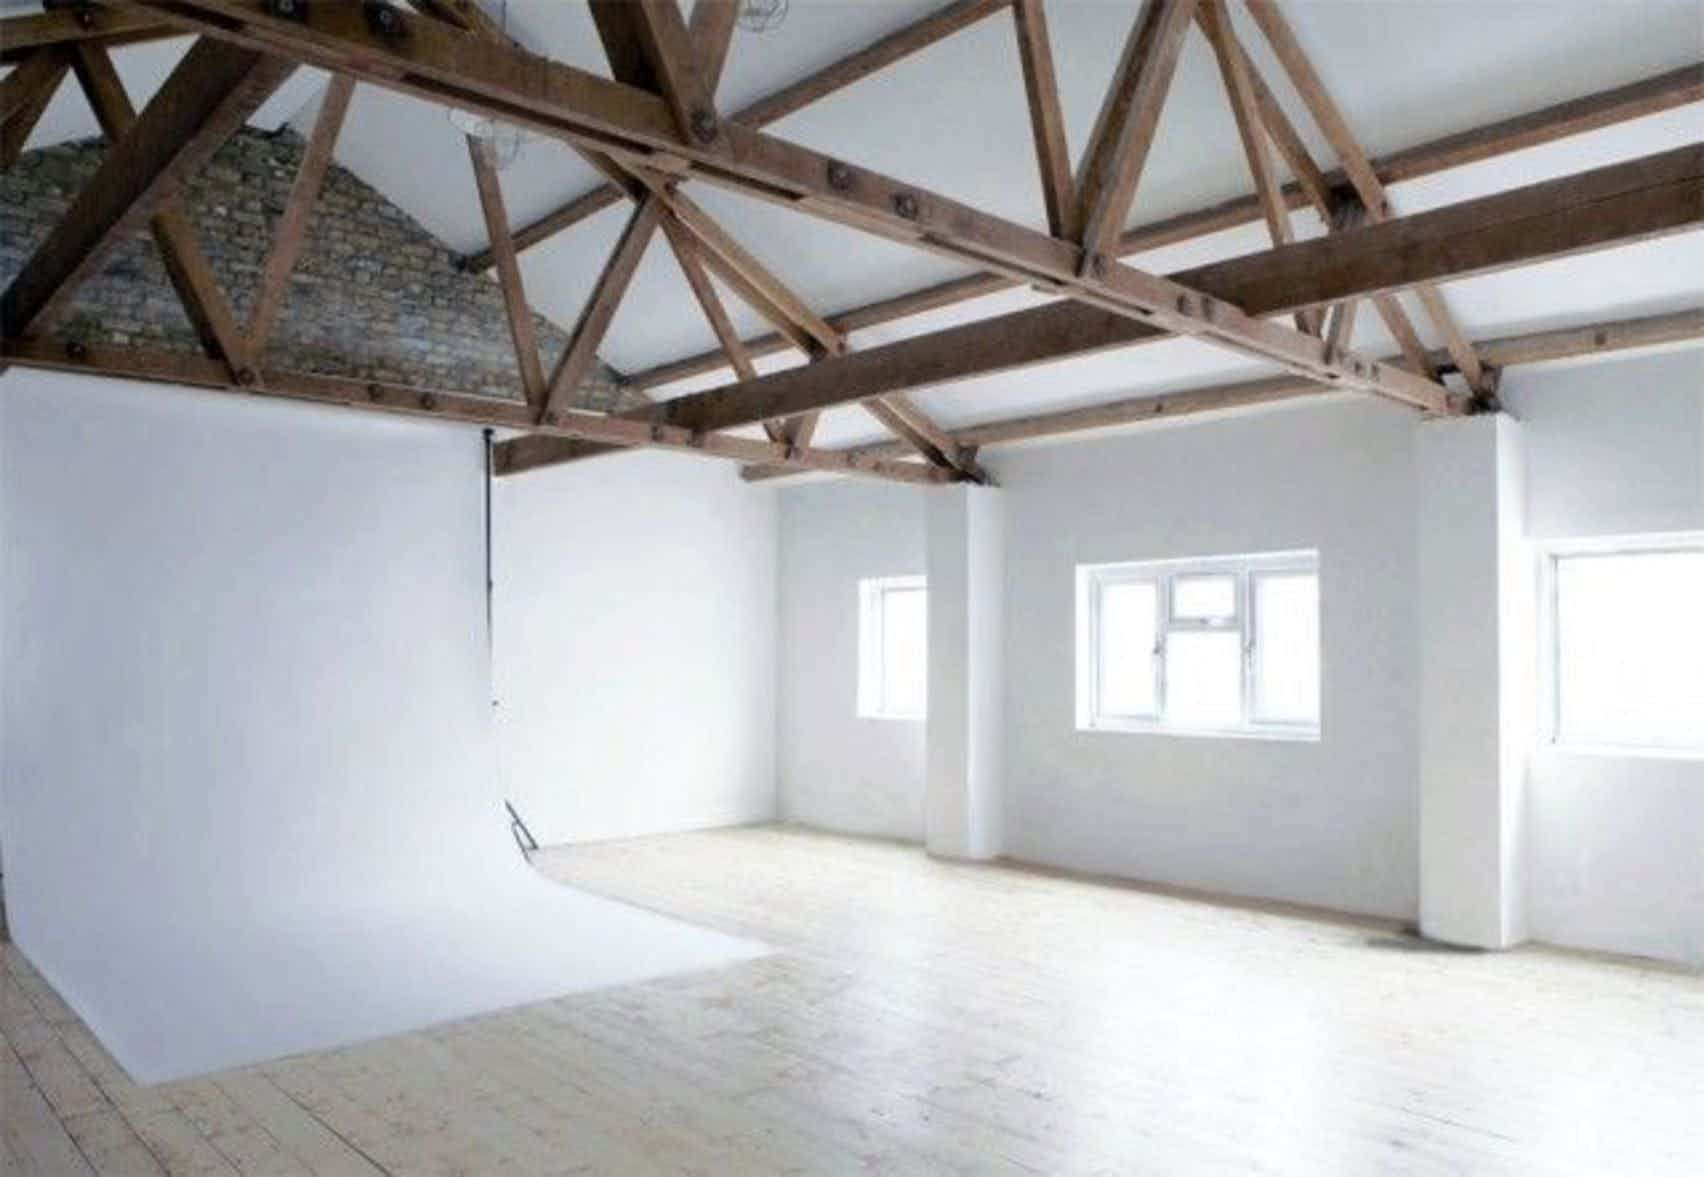 Studio 3, Apiary Studios